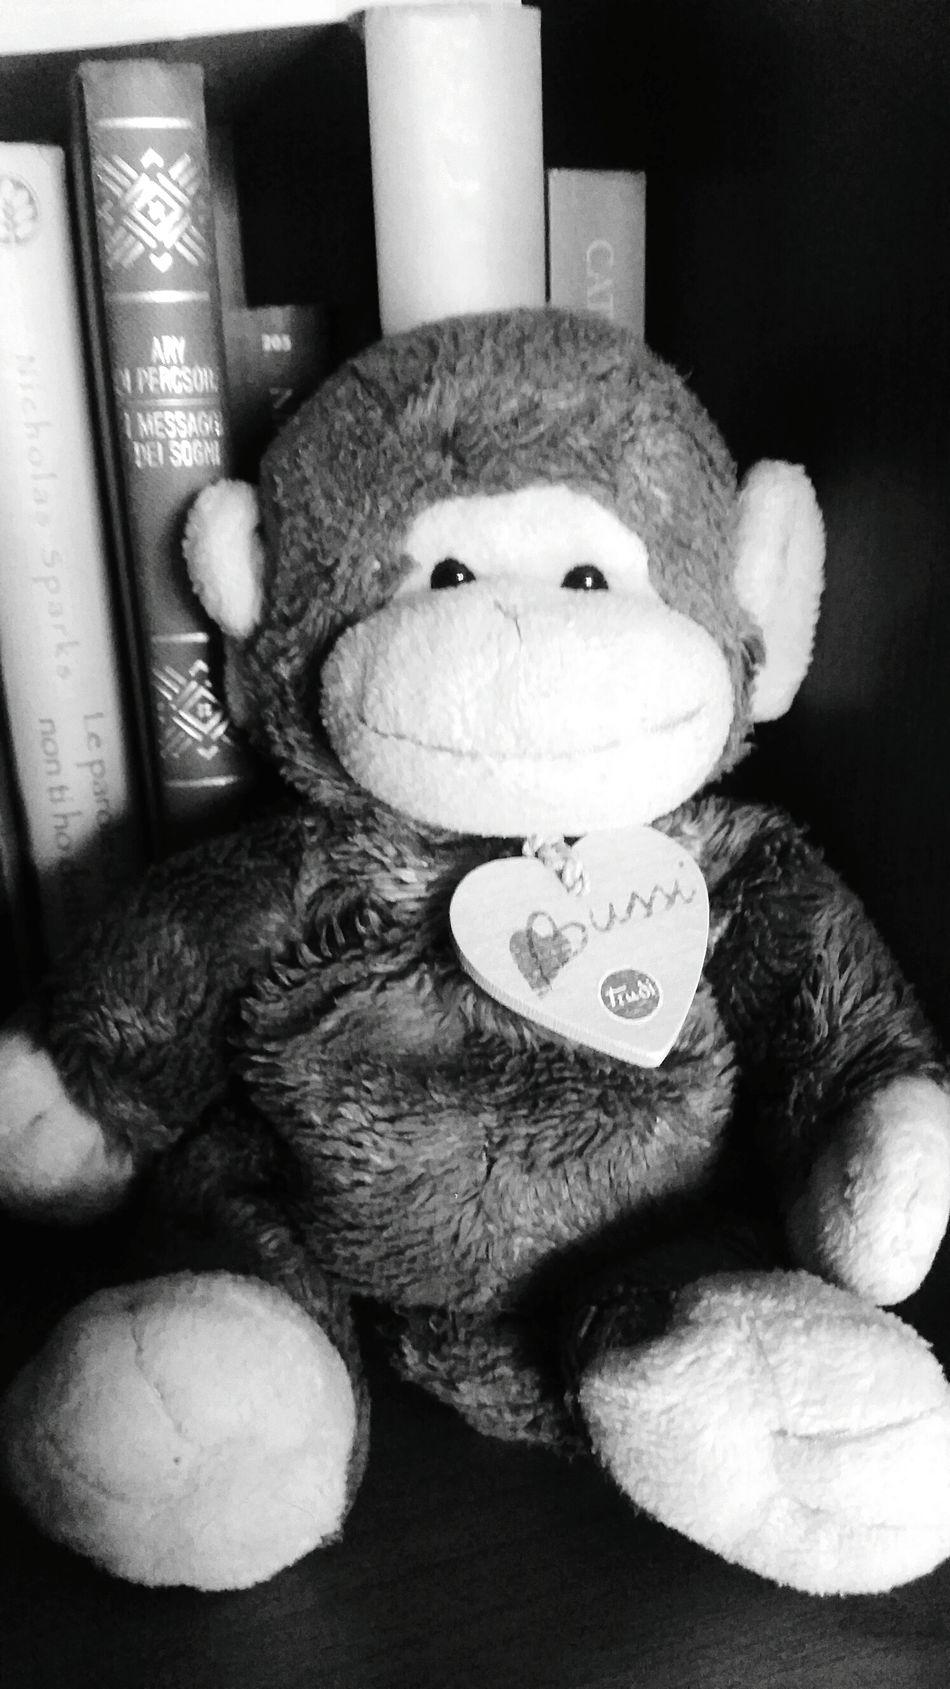 Scimmietta Monkey Libri  Books Leggere Tenderness Pupazzi